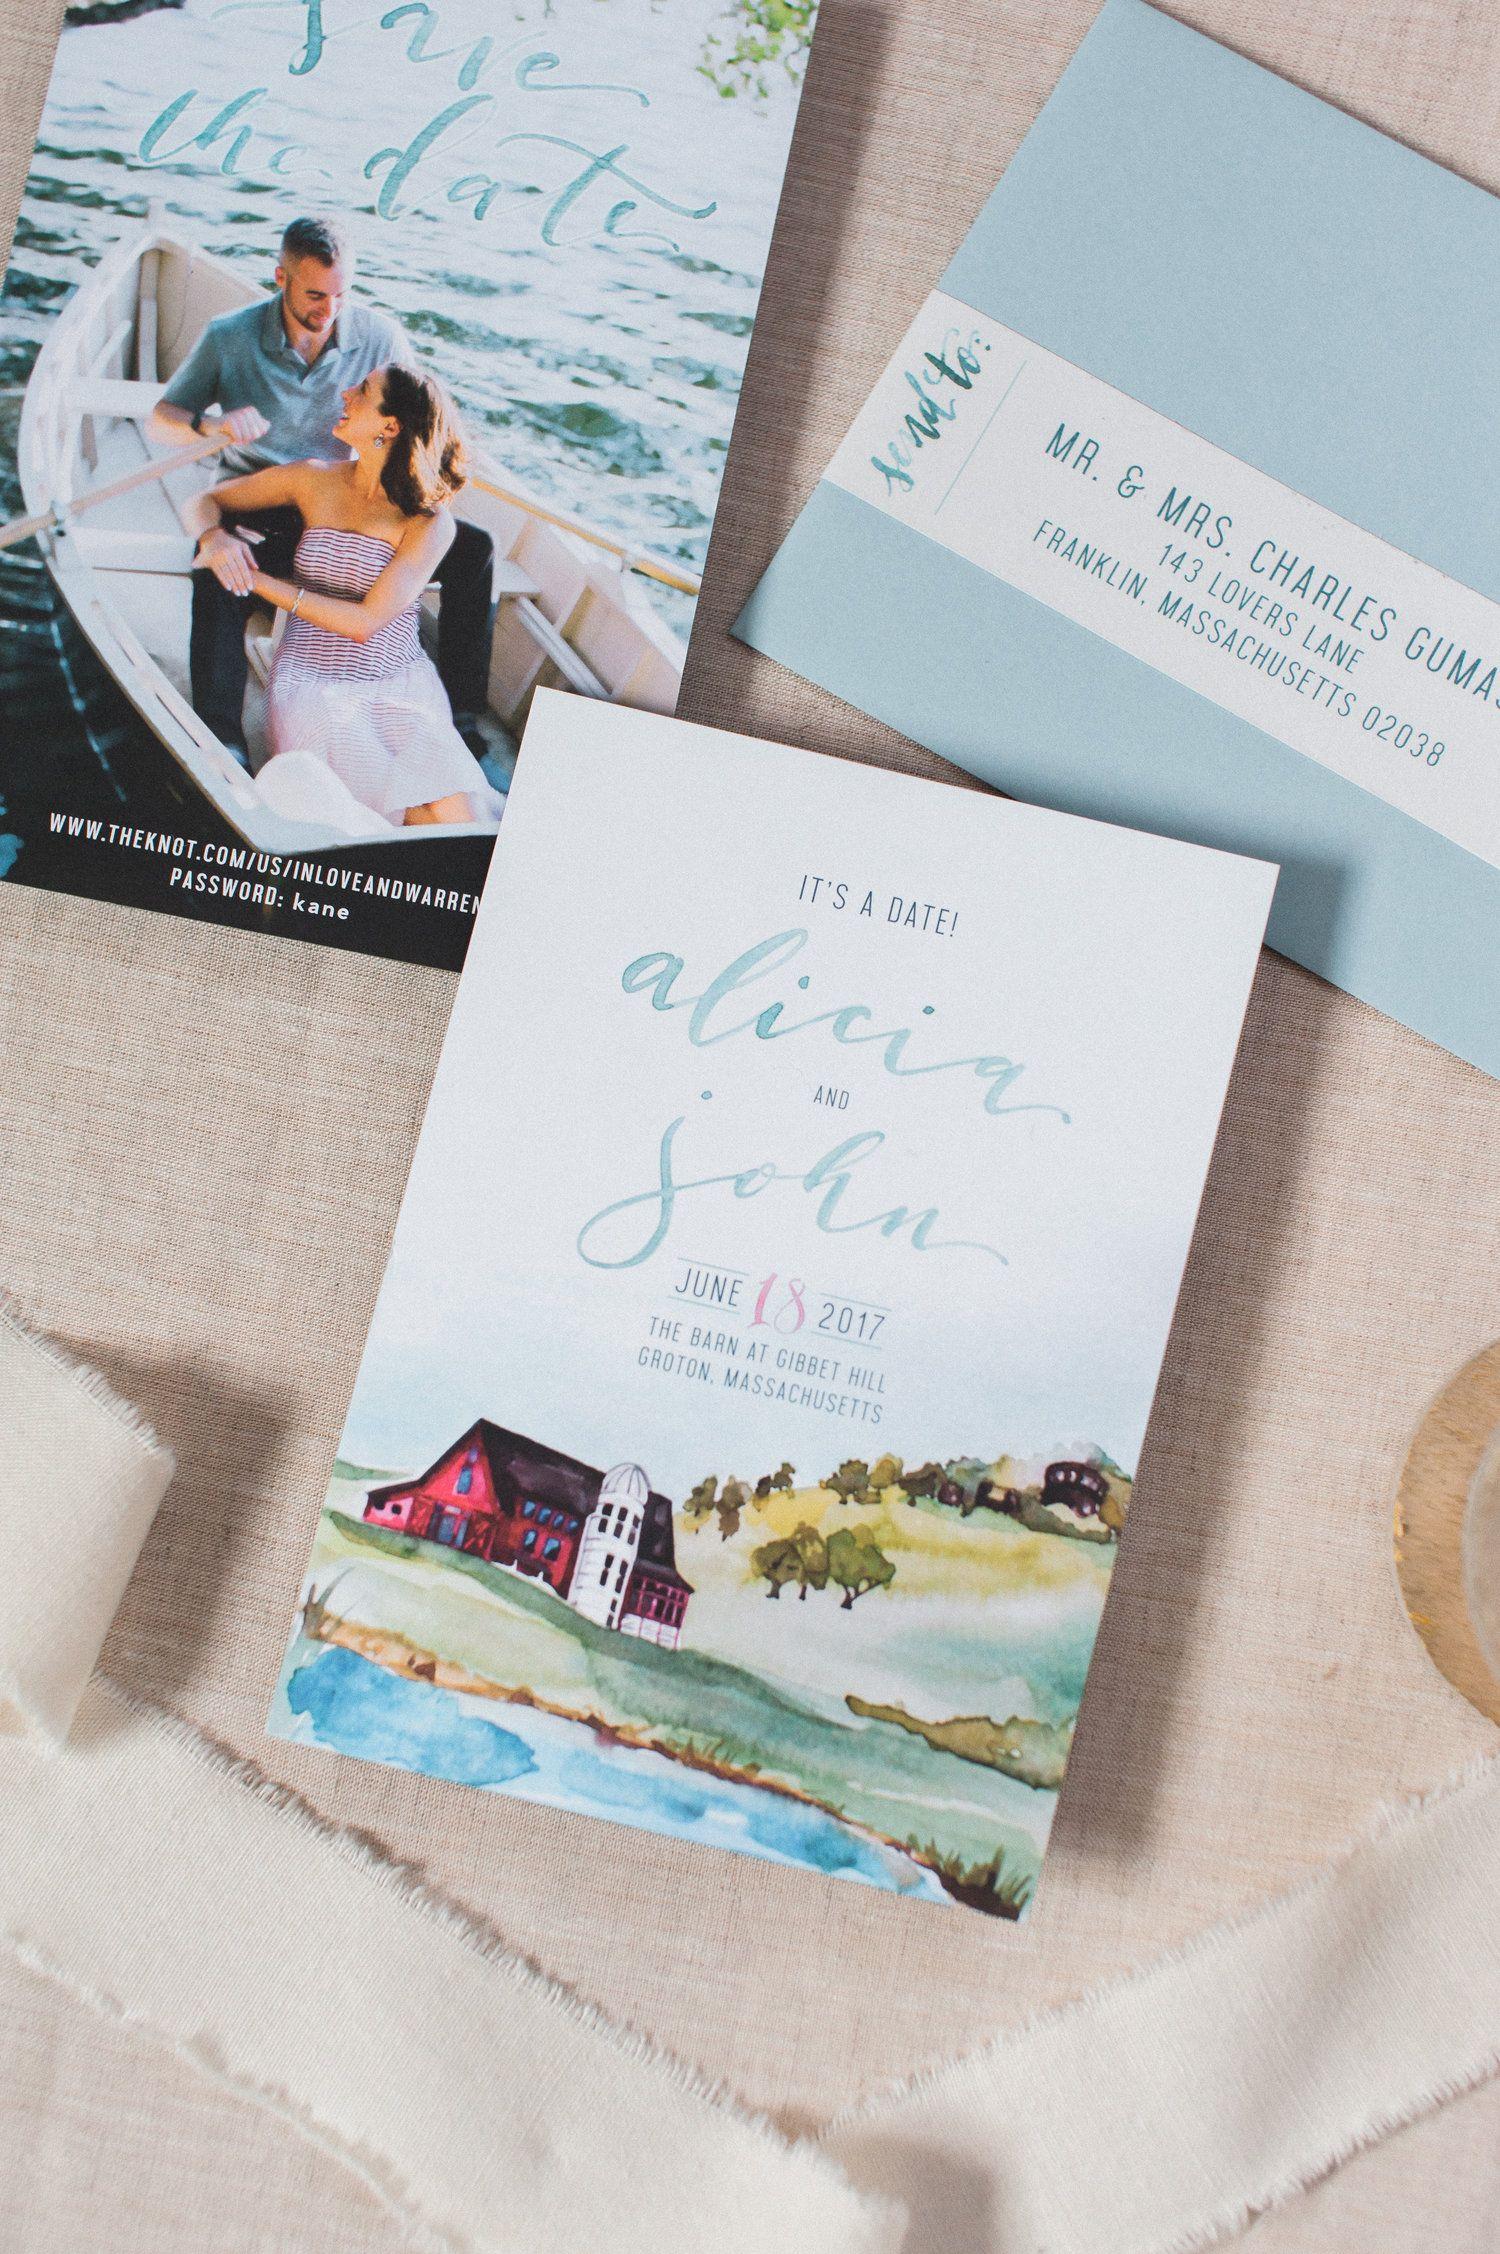 custom wedding invitations new york city%0A resignation letter document